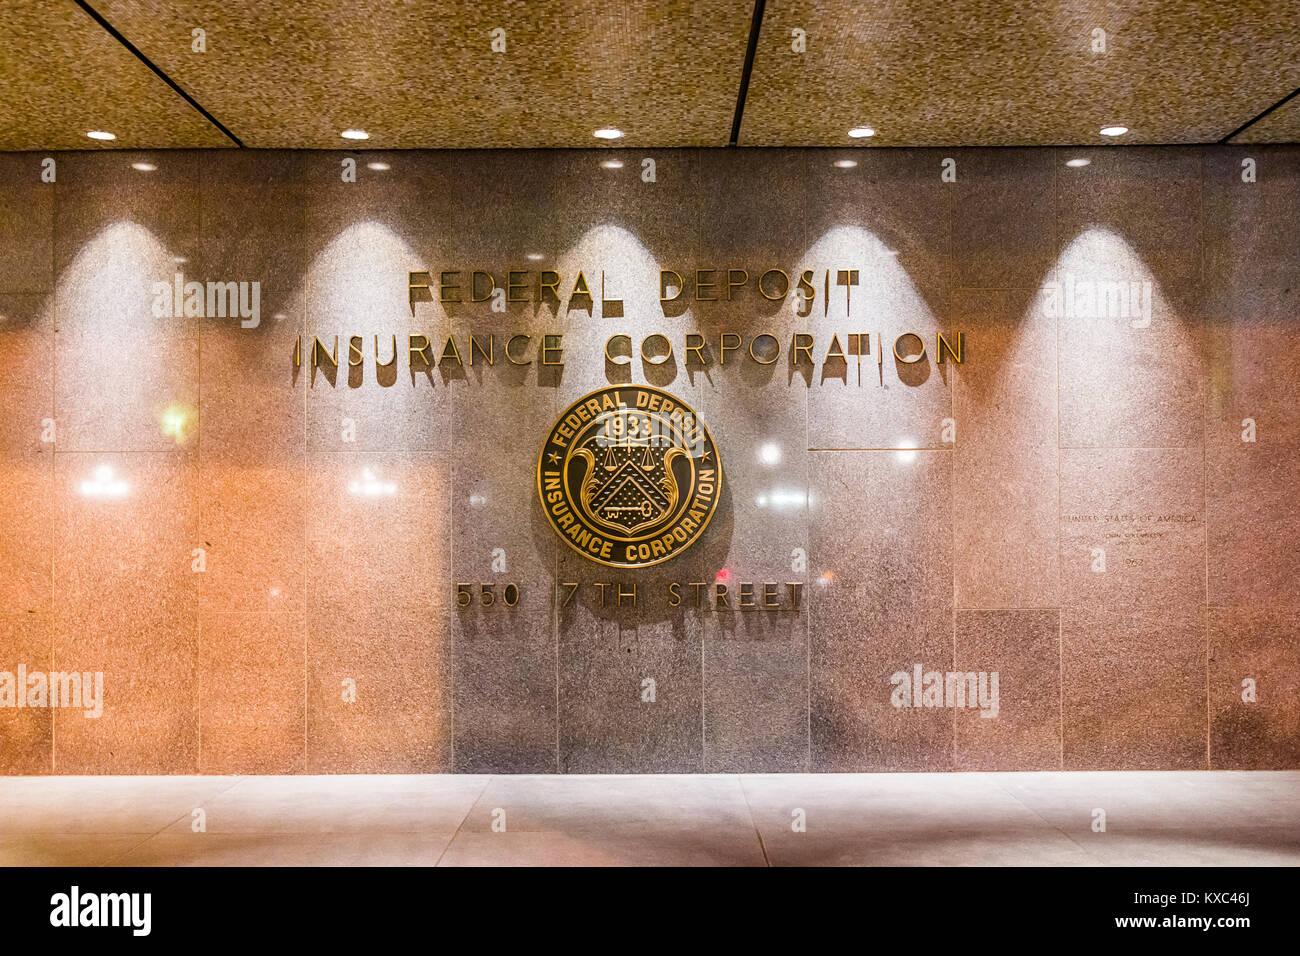 Washington DC, USA - December 28, 2017: FDIC United States Federal Deposit Insurance Corporation sign on wall of - Stock Image